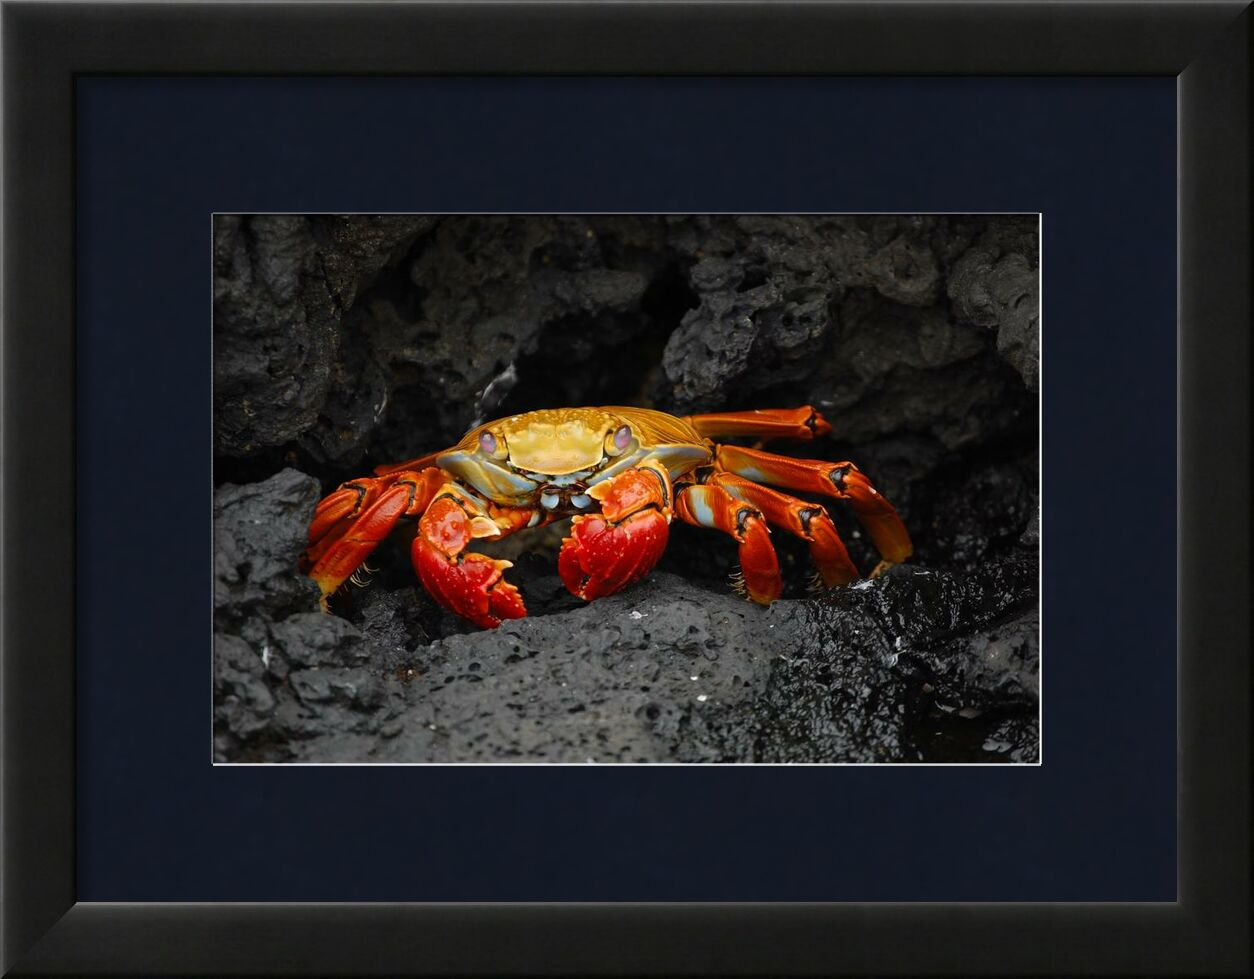 Crab from Aliss ART, Prodi Art, animal, creature, rocks, crab, crustacean, grapsus grapsus, red rock crab, shellfish